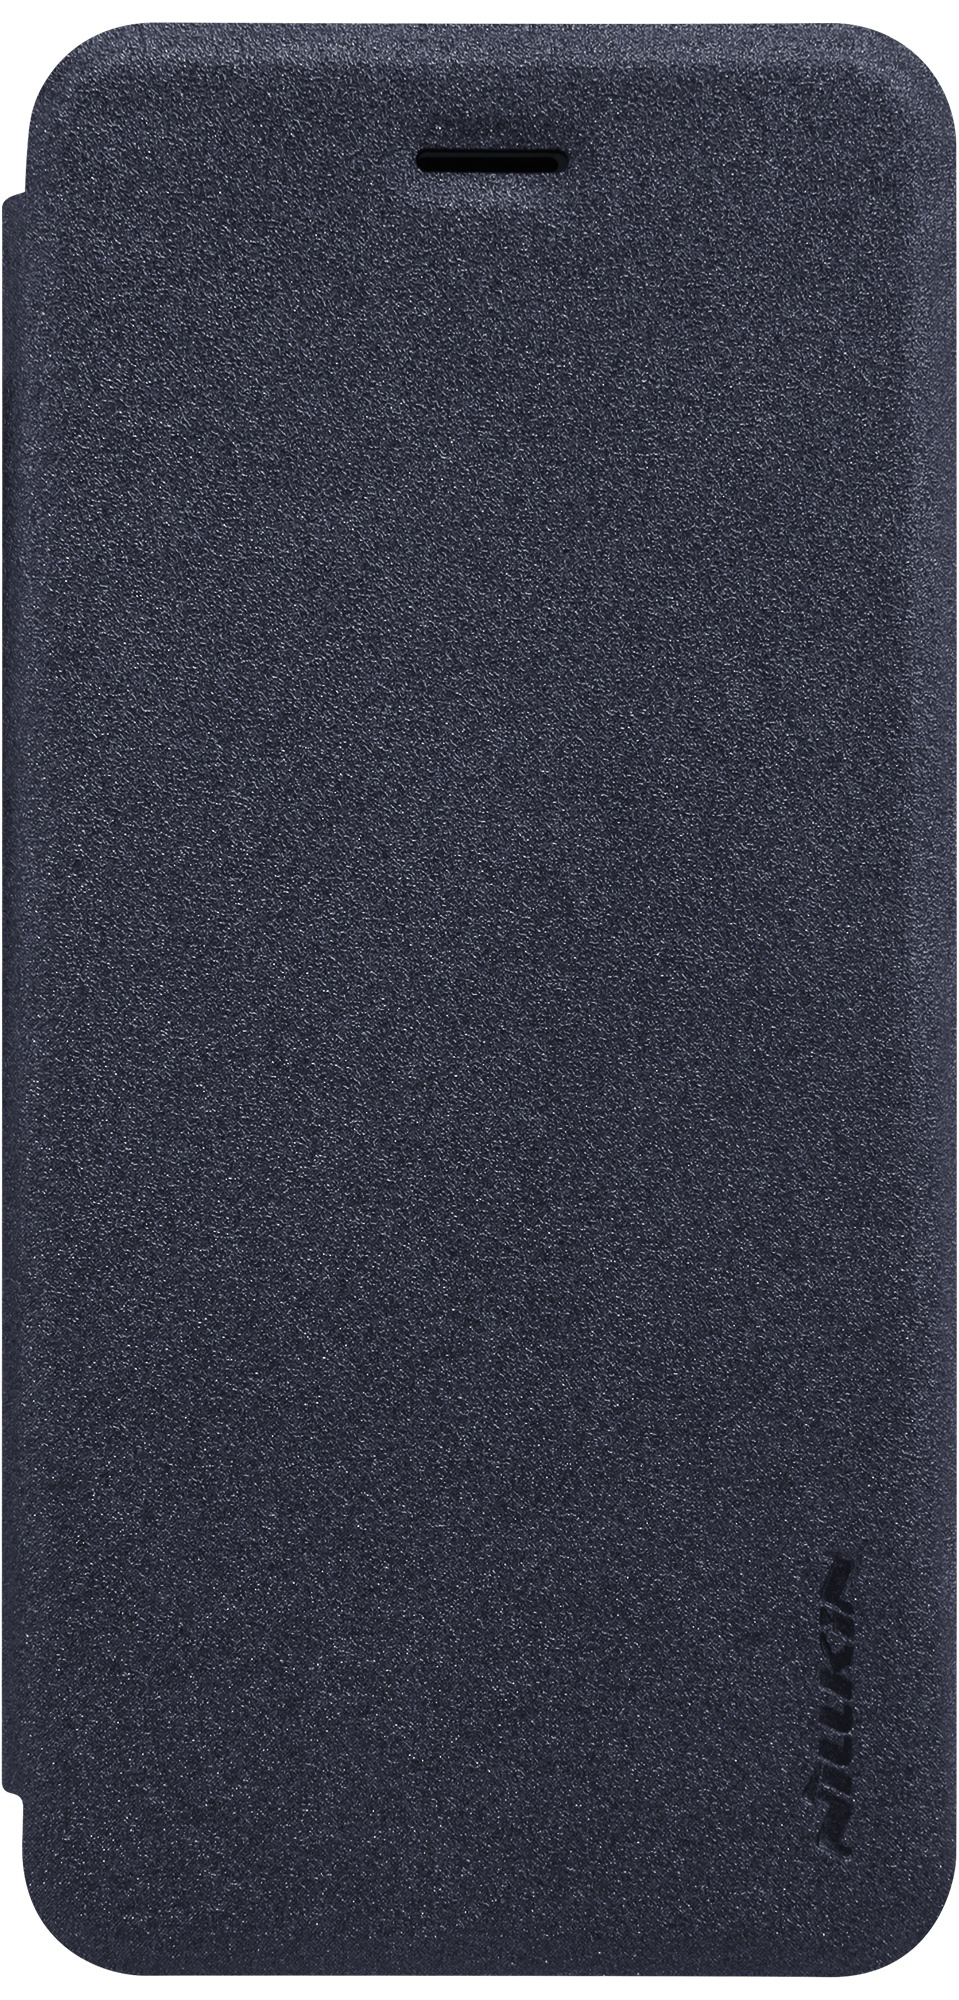 Чехол Nillkin, для iPhone 7+/8+, 6902048127722, черный